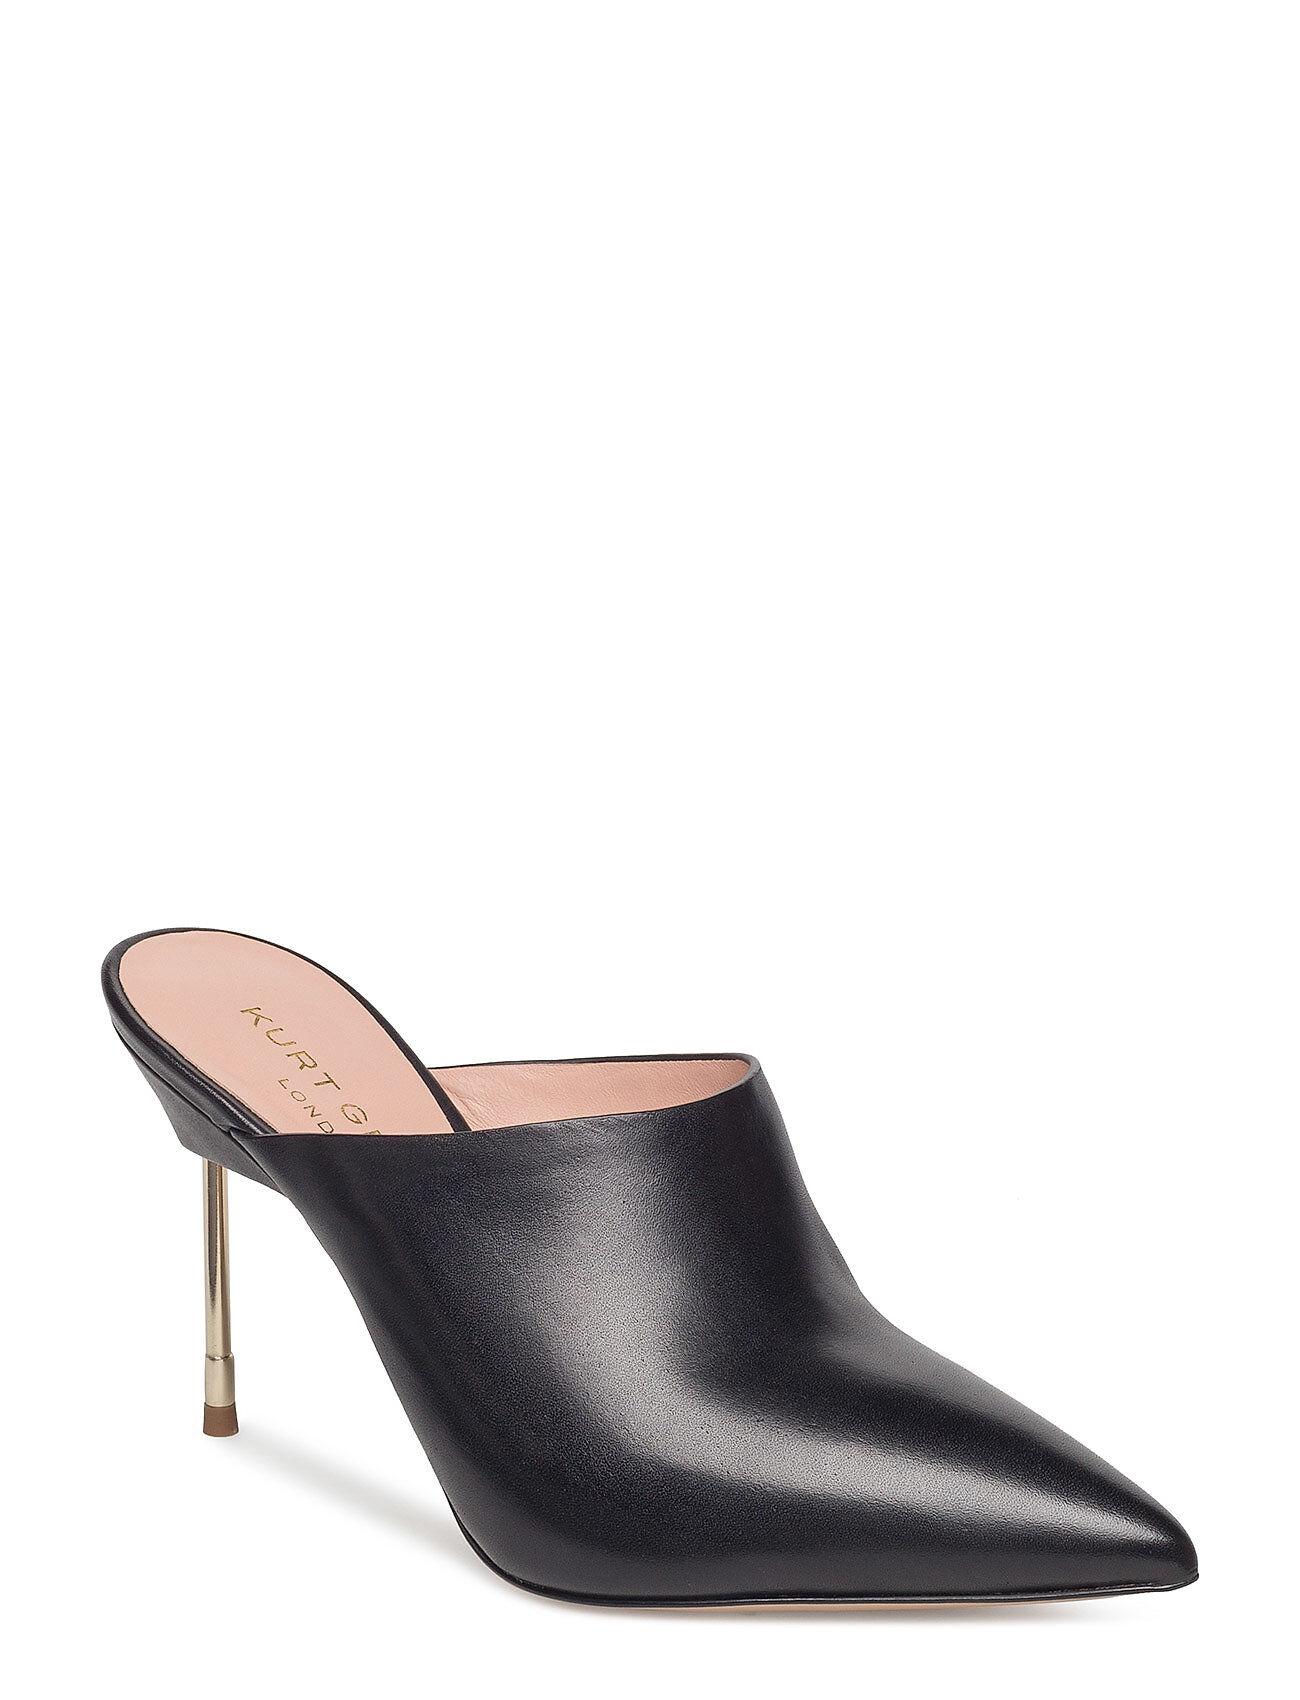 Kurt Geiger London Berner 90 Shoes Mules & Slip-ins Pumps Classic Musta Kurt Geiger London